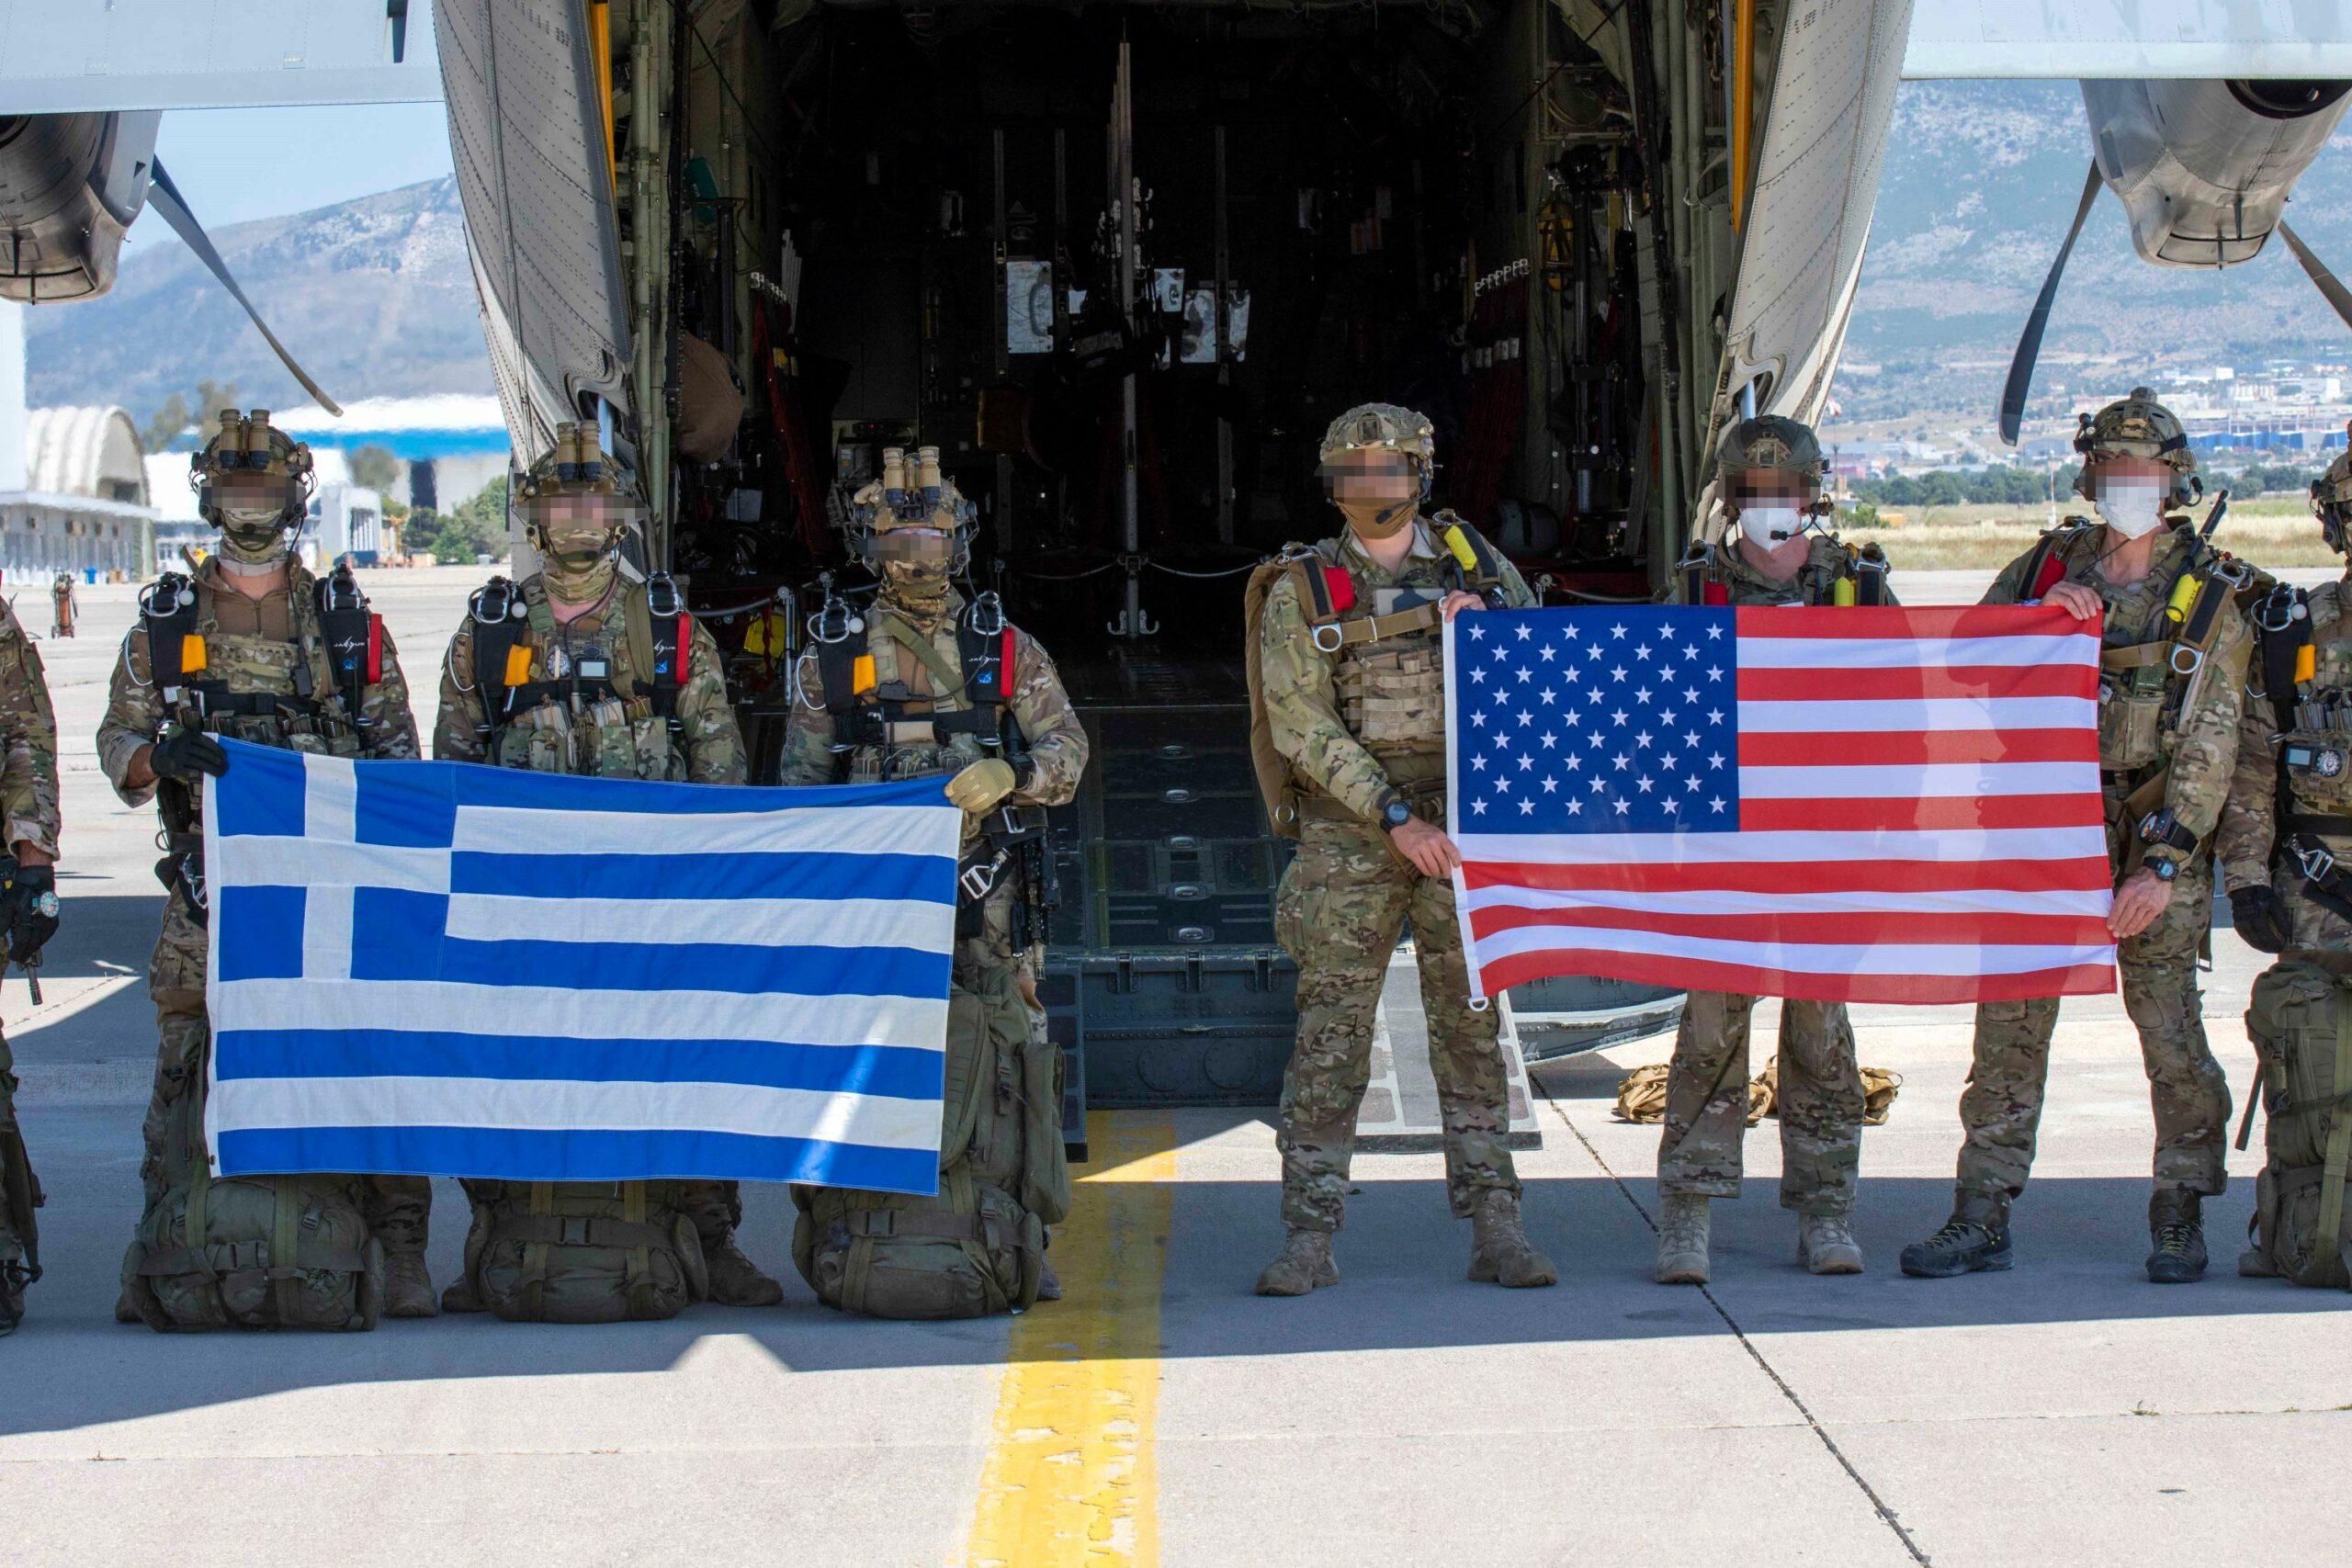 Stolen Cerberus: Επίδειξη ισχύος από Έλληνες και Αμερικανούς κομάντο – Δείτε εντυπωσιακά πλάνα [pics,vids]